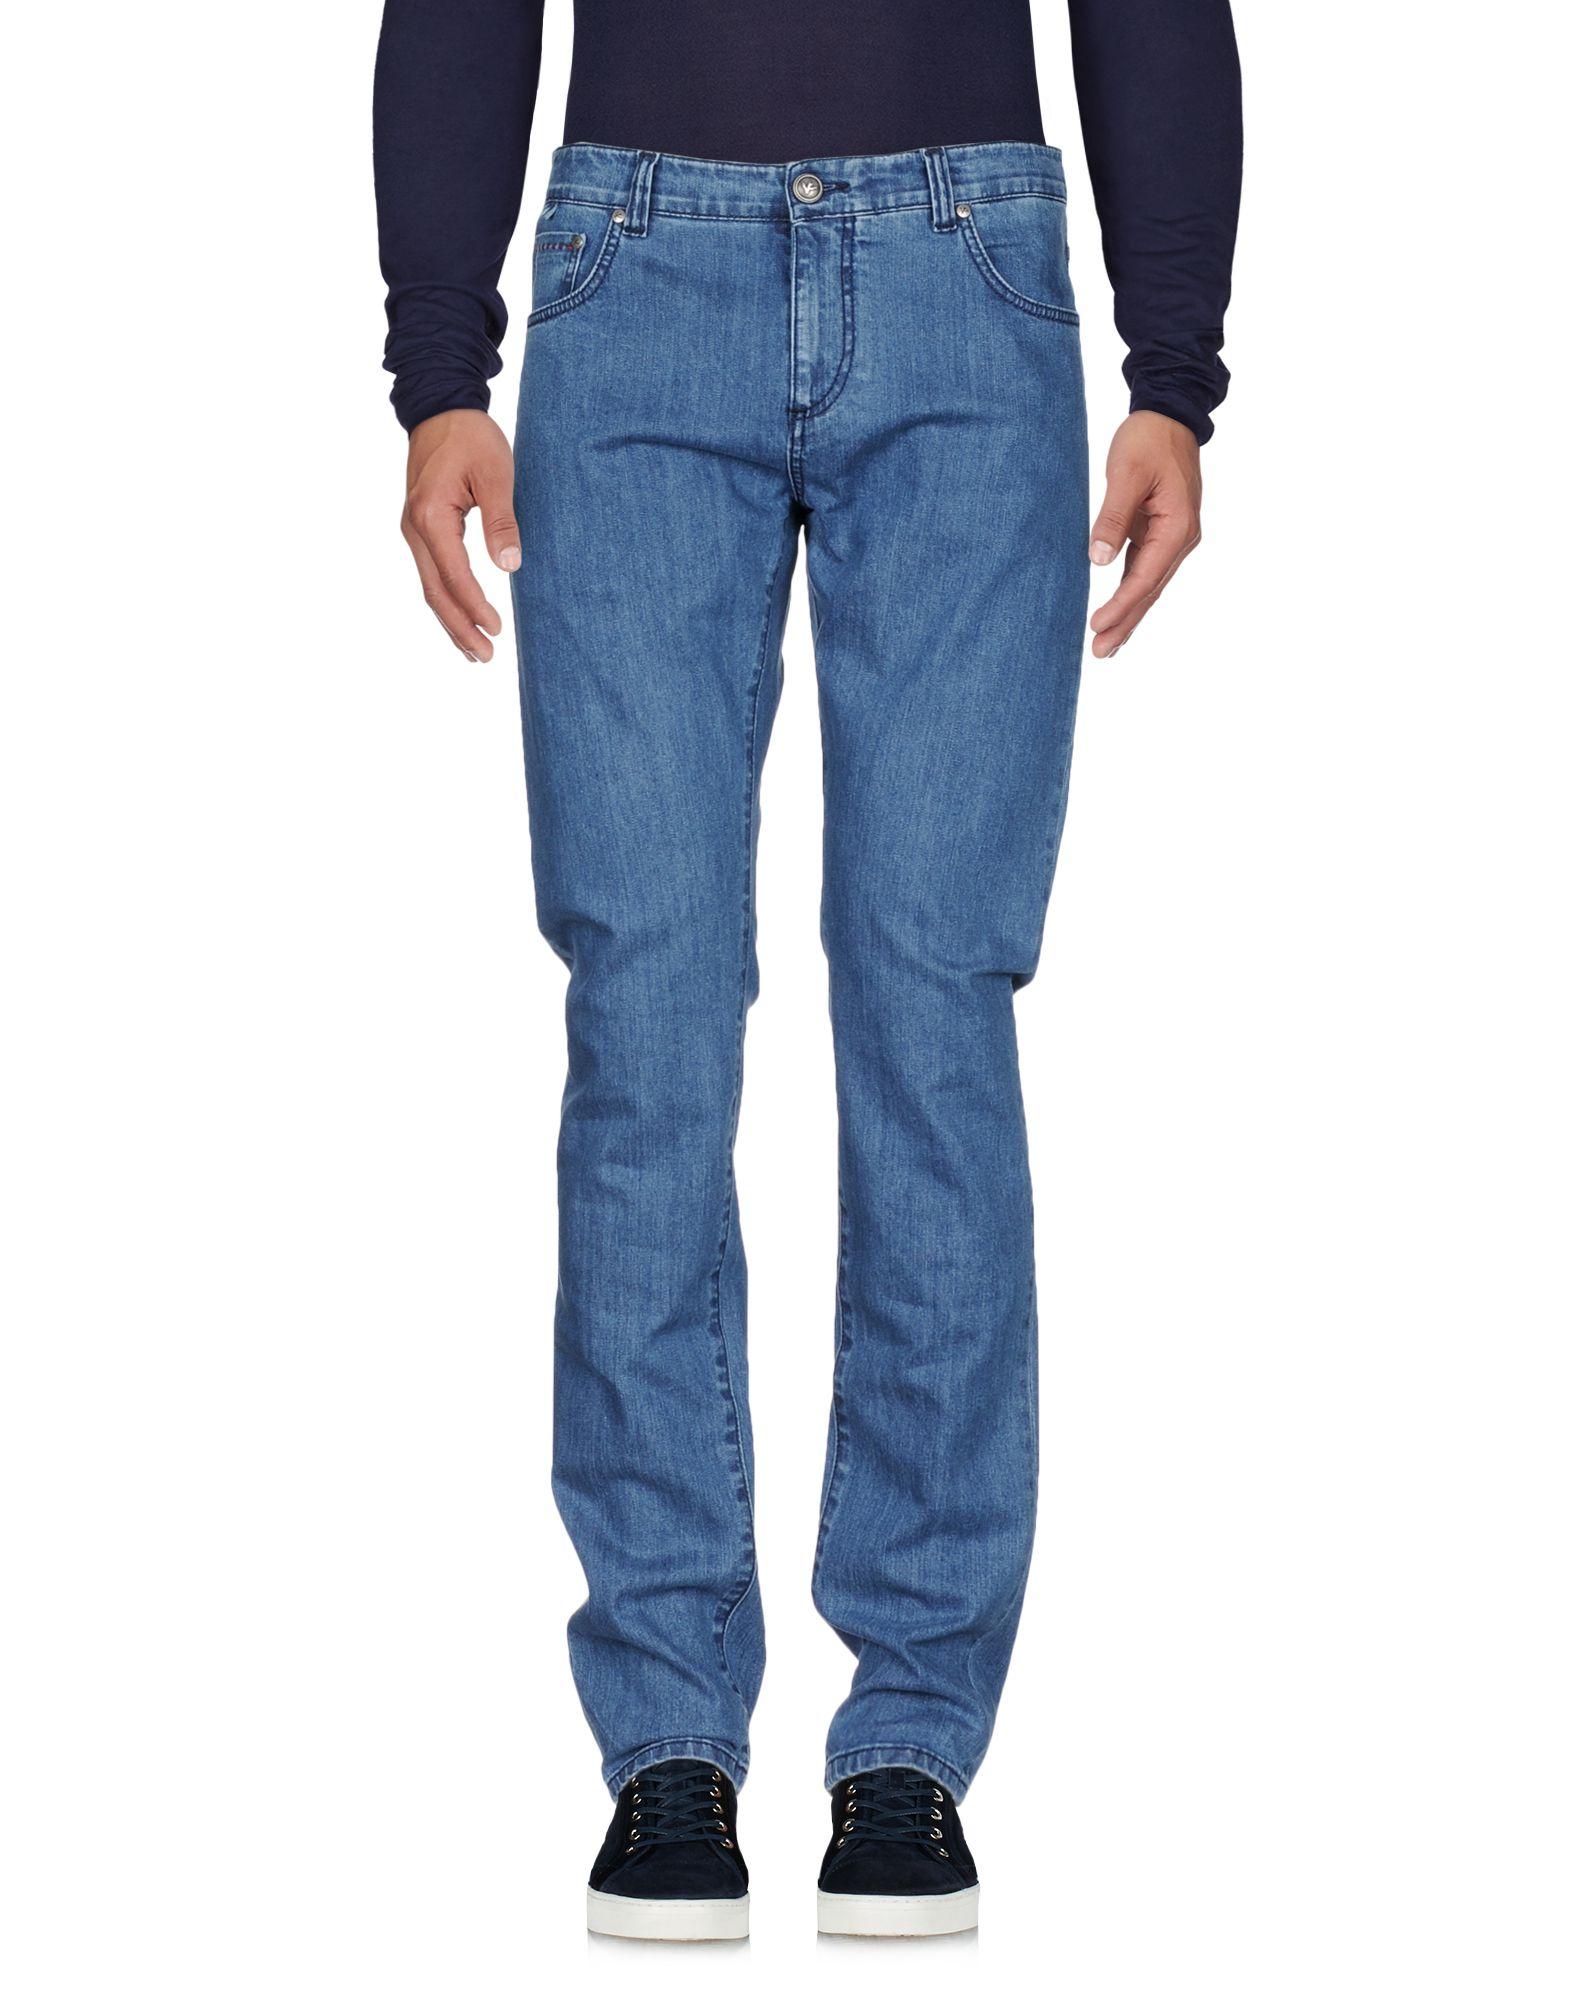 Pantaloni Jeans Isaia Donna - Acquista online su